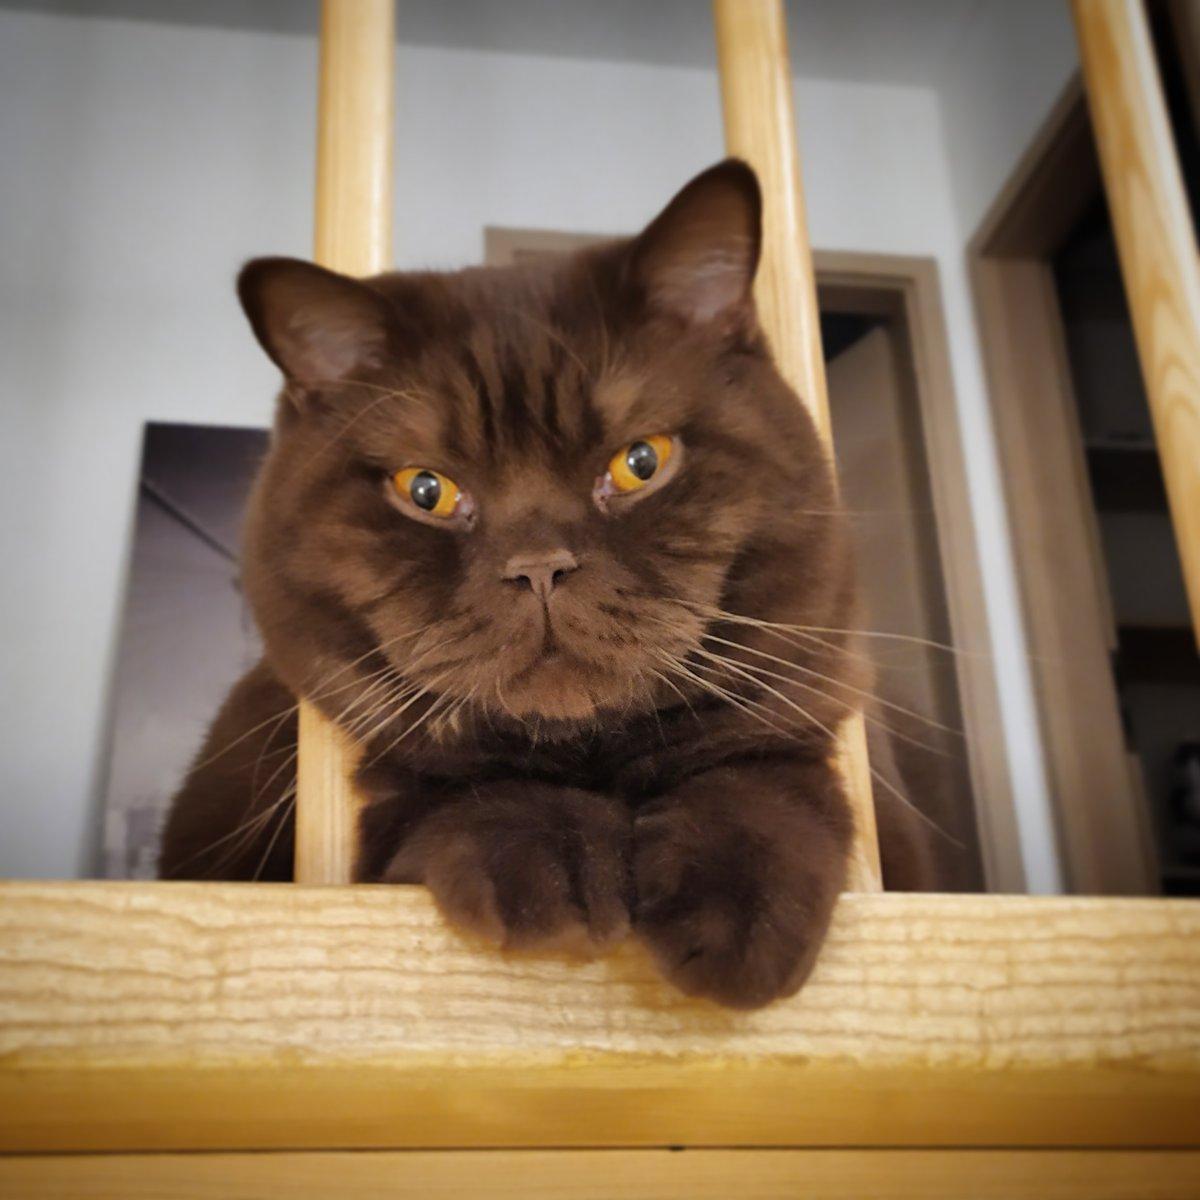 Löwe  im Käfig #katzen #katzenliebe #kitty #cute #petstagram #lovecats #catphoto #catworld #animal #stubentiger #hauskatze #britishkurzhaar #meinekatze #löwe #tierfotografiemitherz #bestanimalpics #simbapic.twitter.com/380sZLczRX